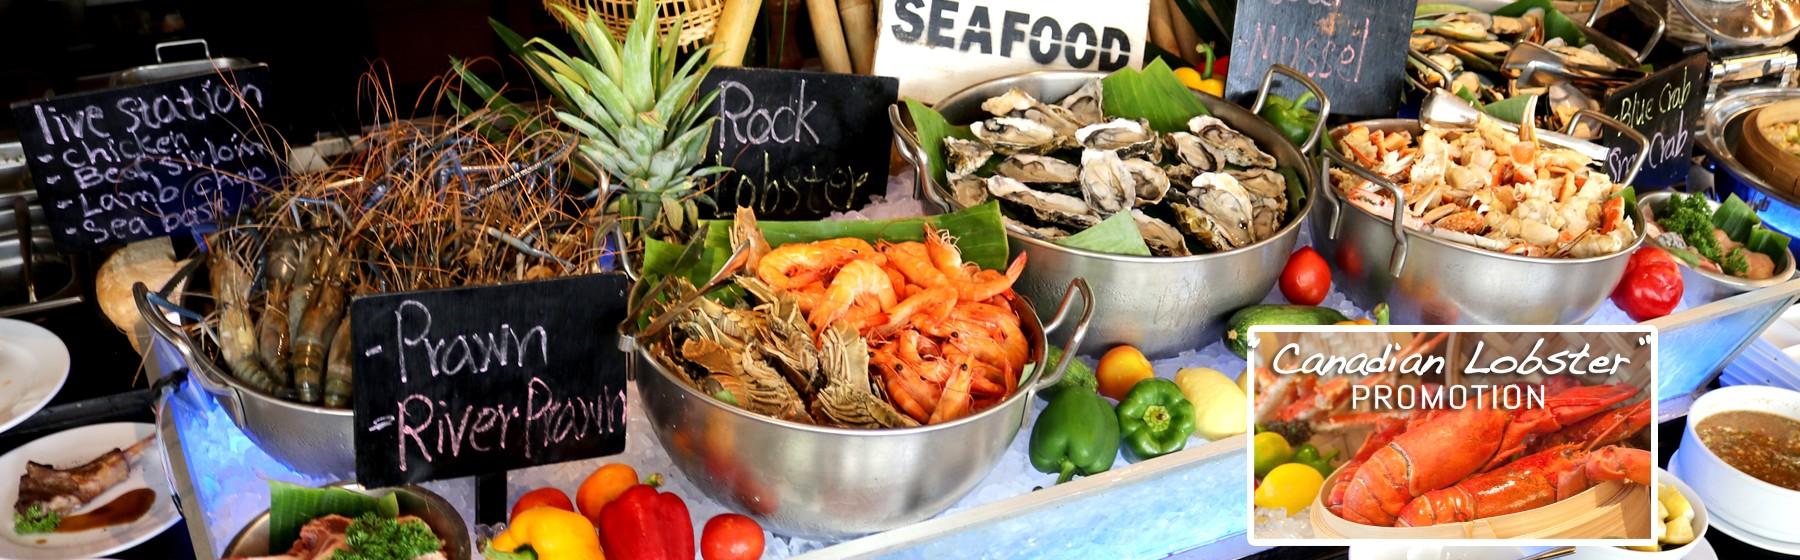 seafood-sunday-brunch